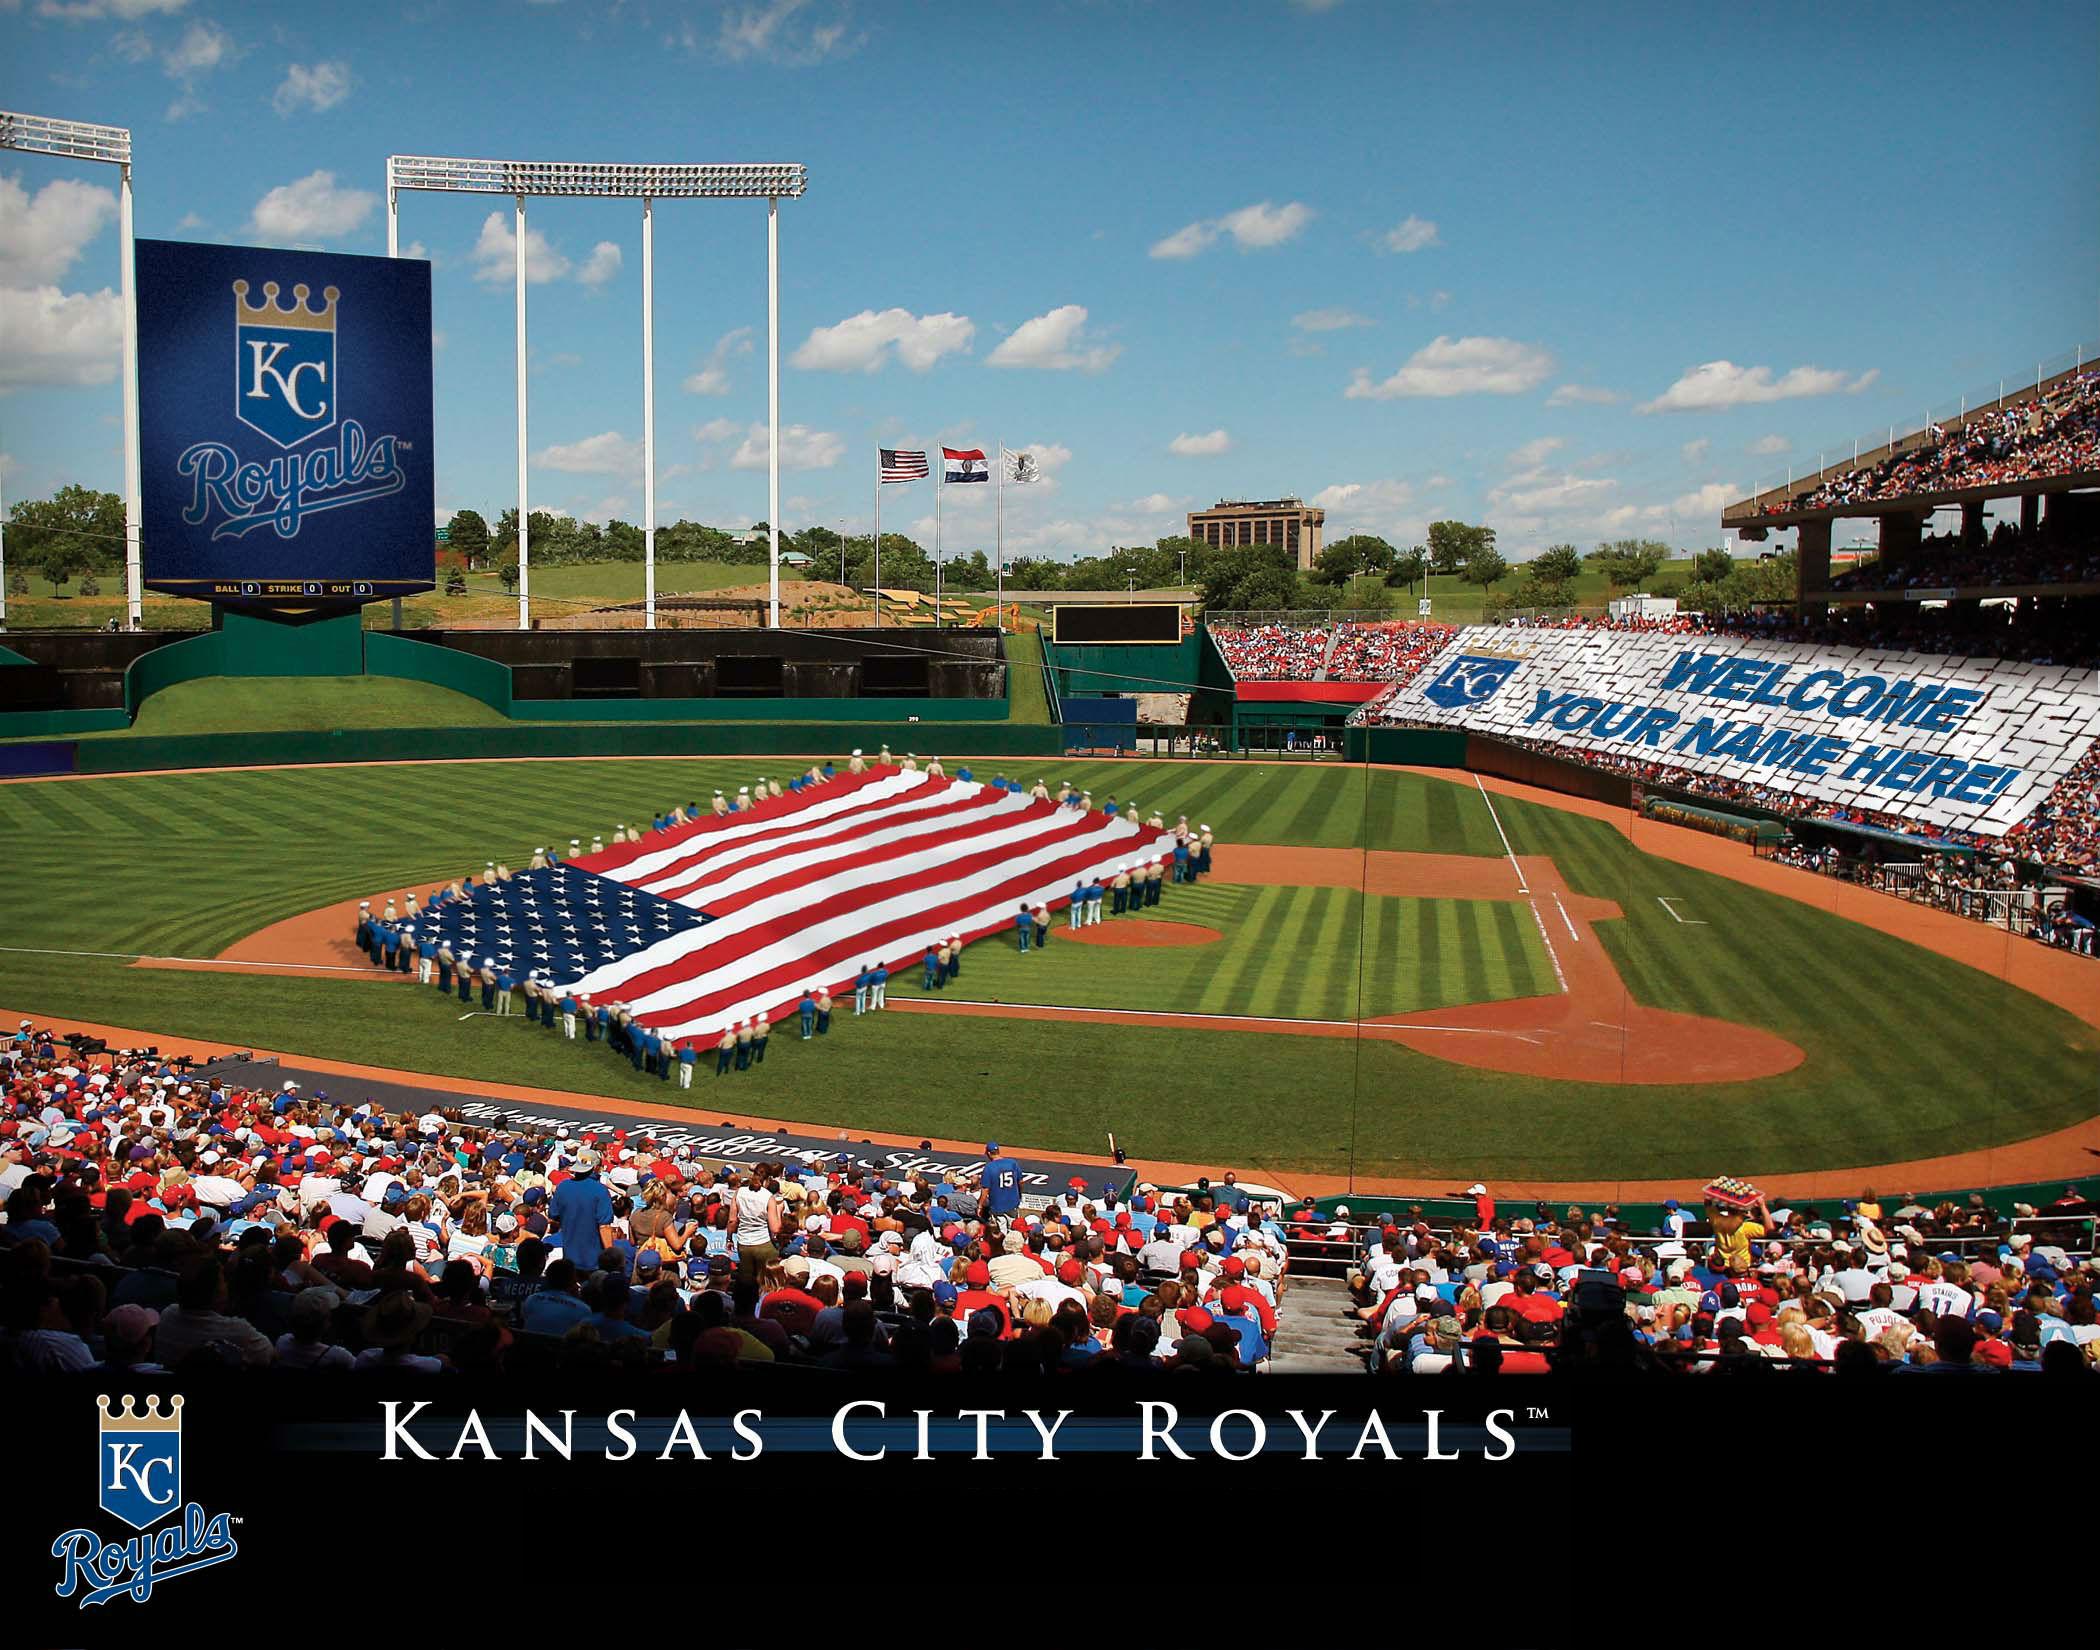 KANSAS CITY ROYALS mlb baseball 25 wallpaper 2100x1650 232217 2100x1650